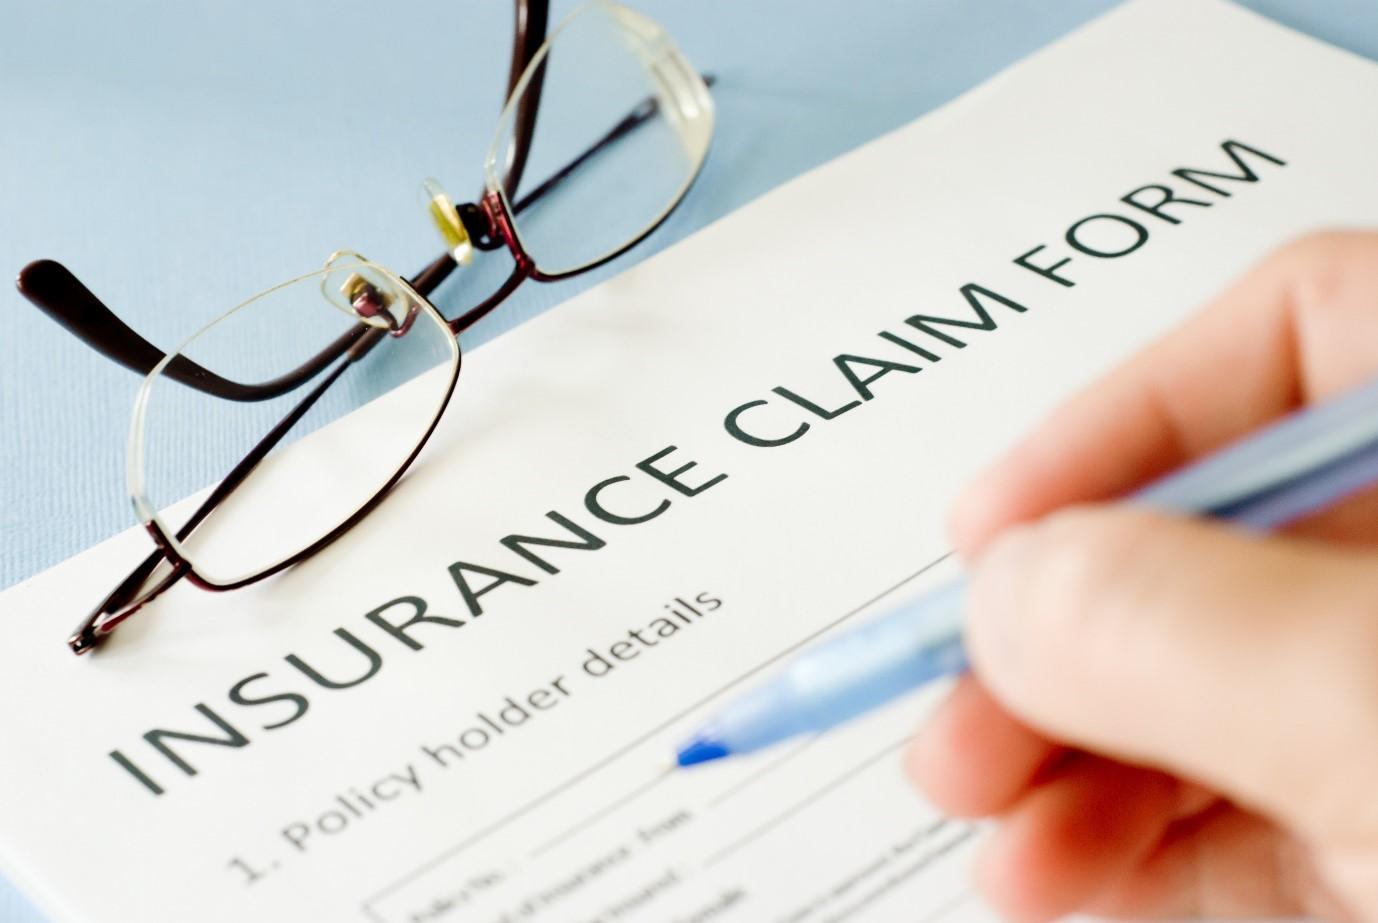 Asuransi-Dibayar-Dimuka4-Harmony